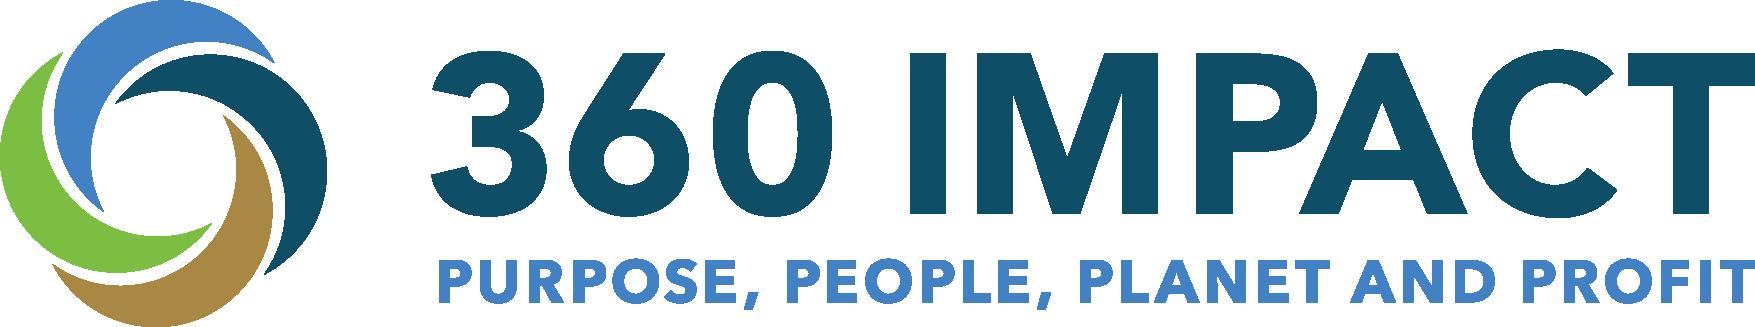 360 Generic Logo-color .png